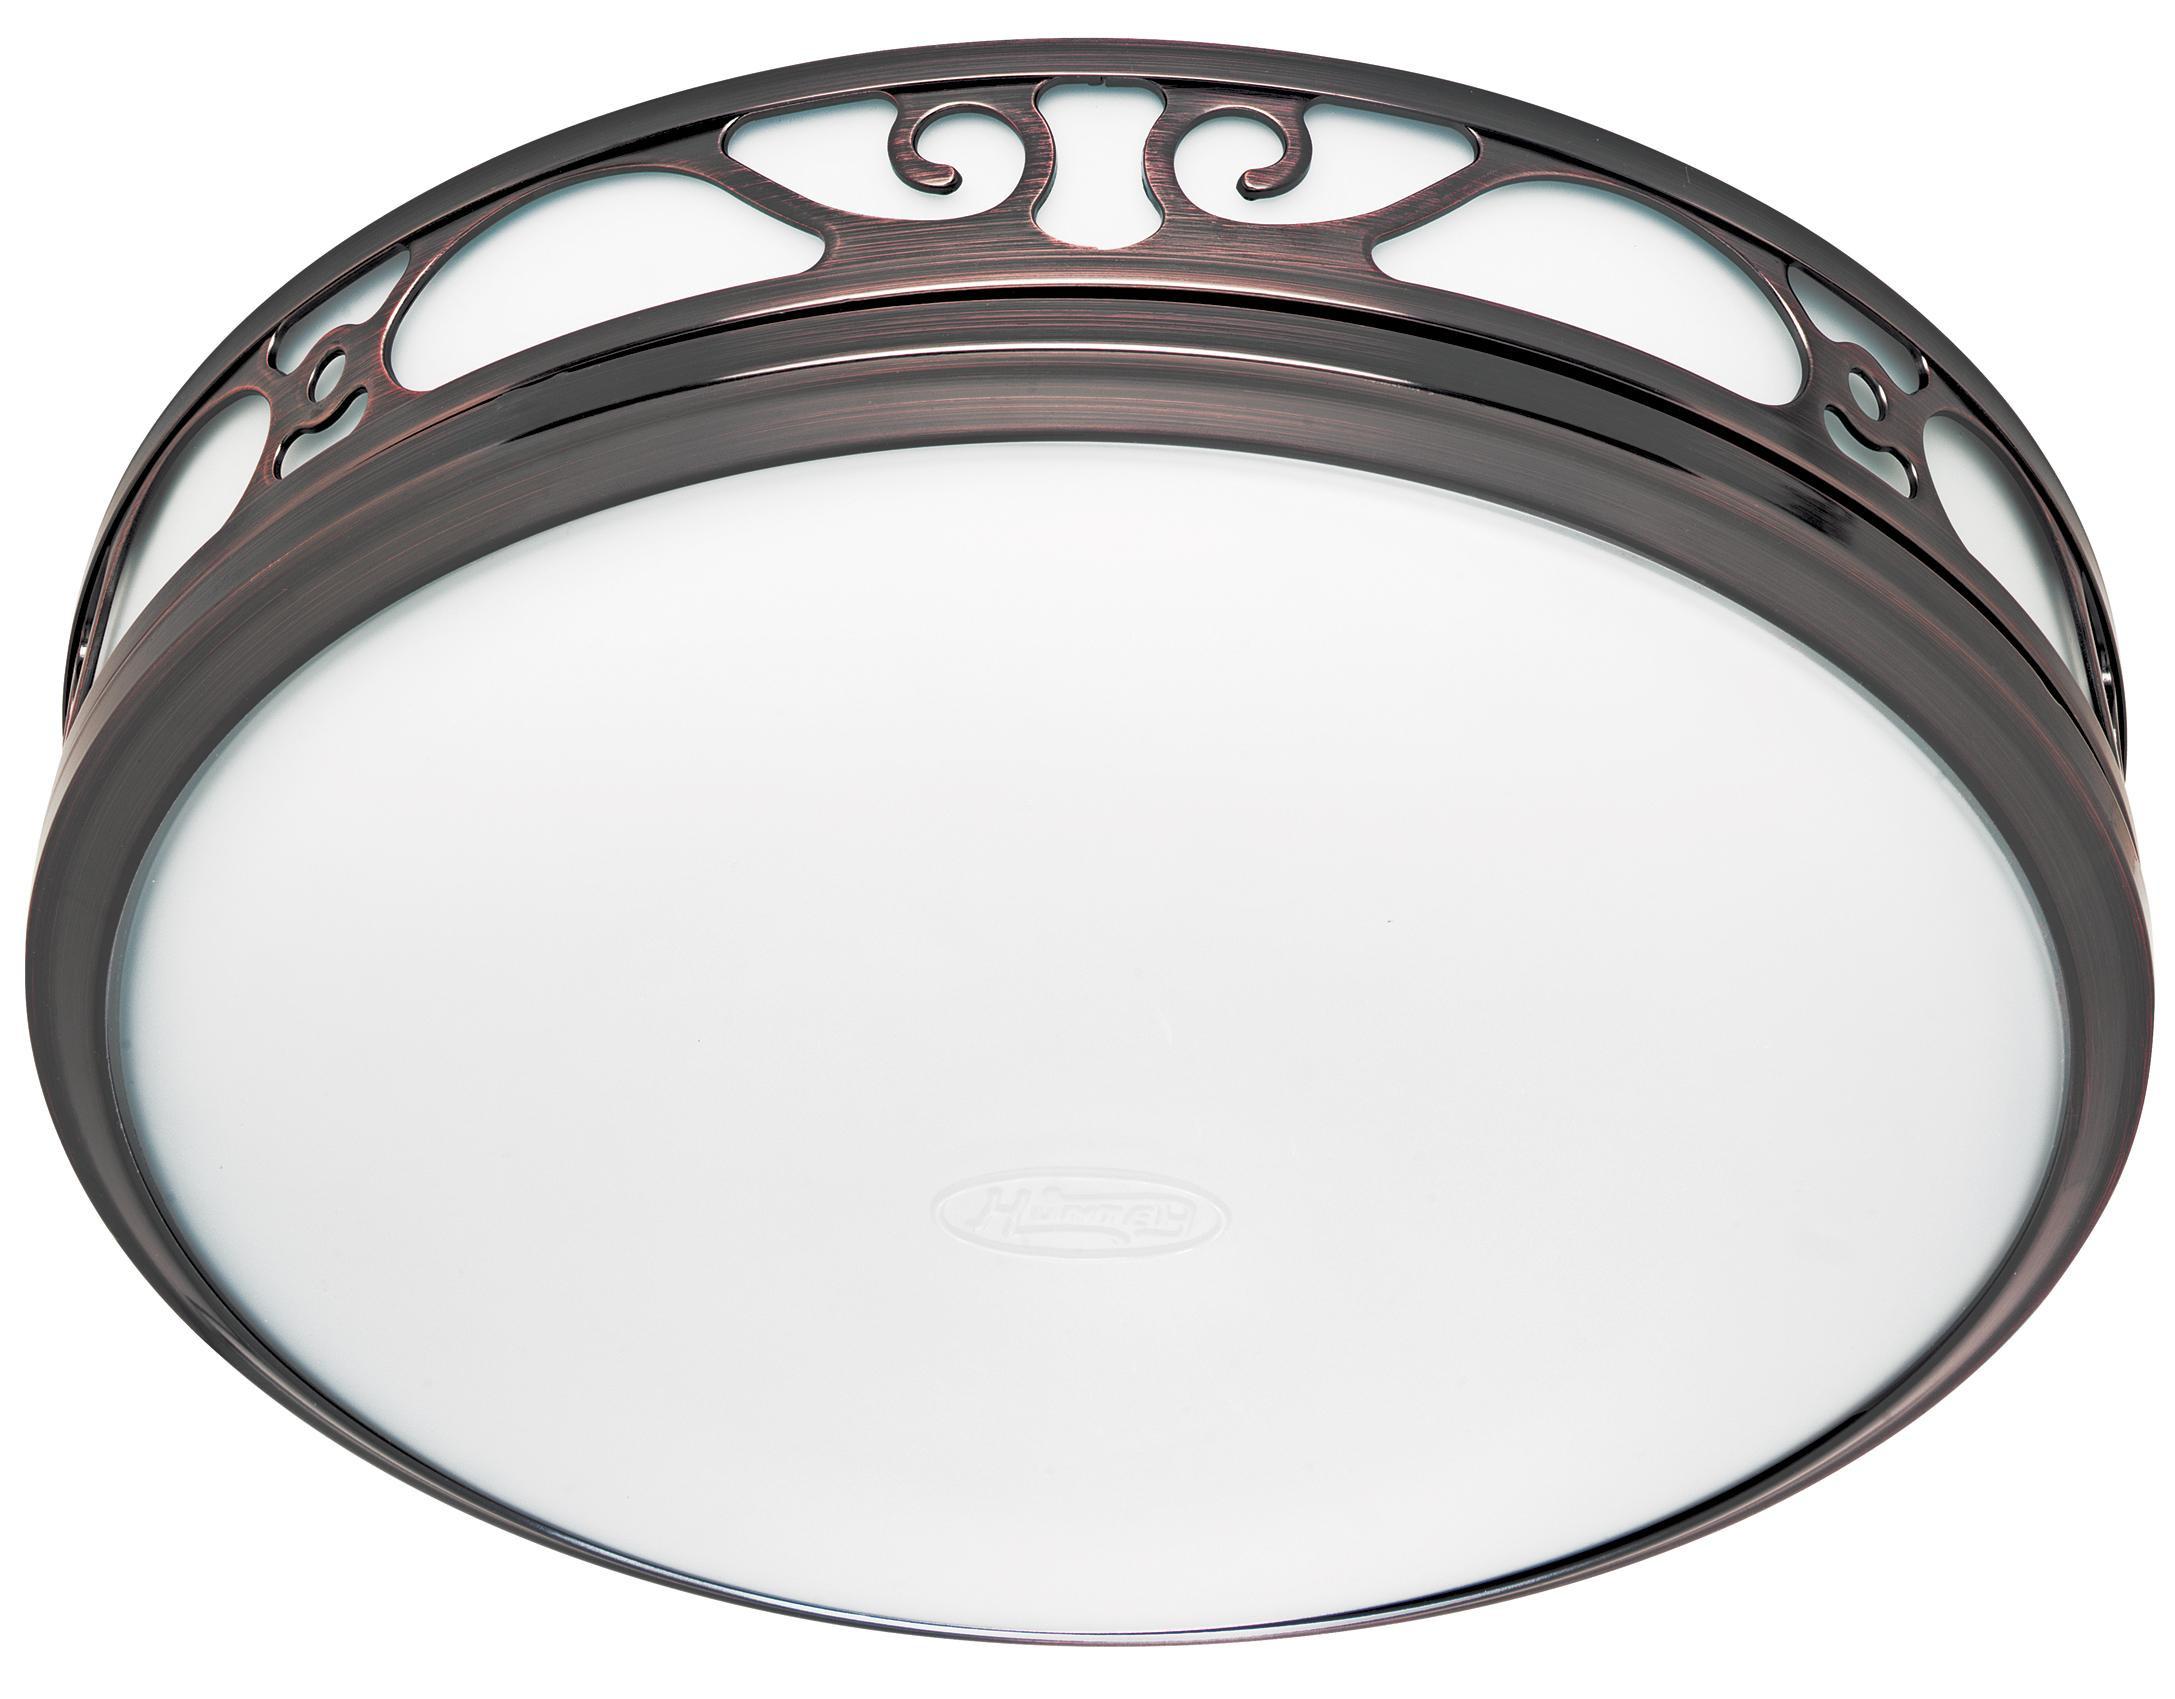 Bathroom Vent And Light  Hunter Ventilation Sona Bathroom Exhaust Fan with